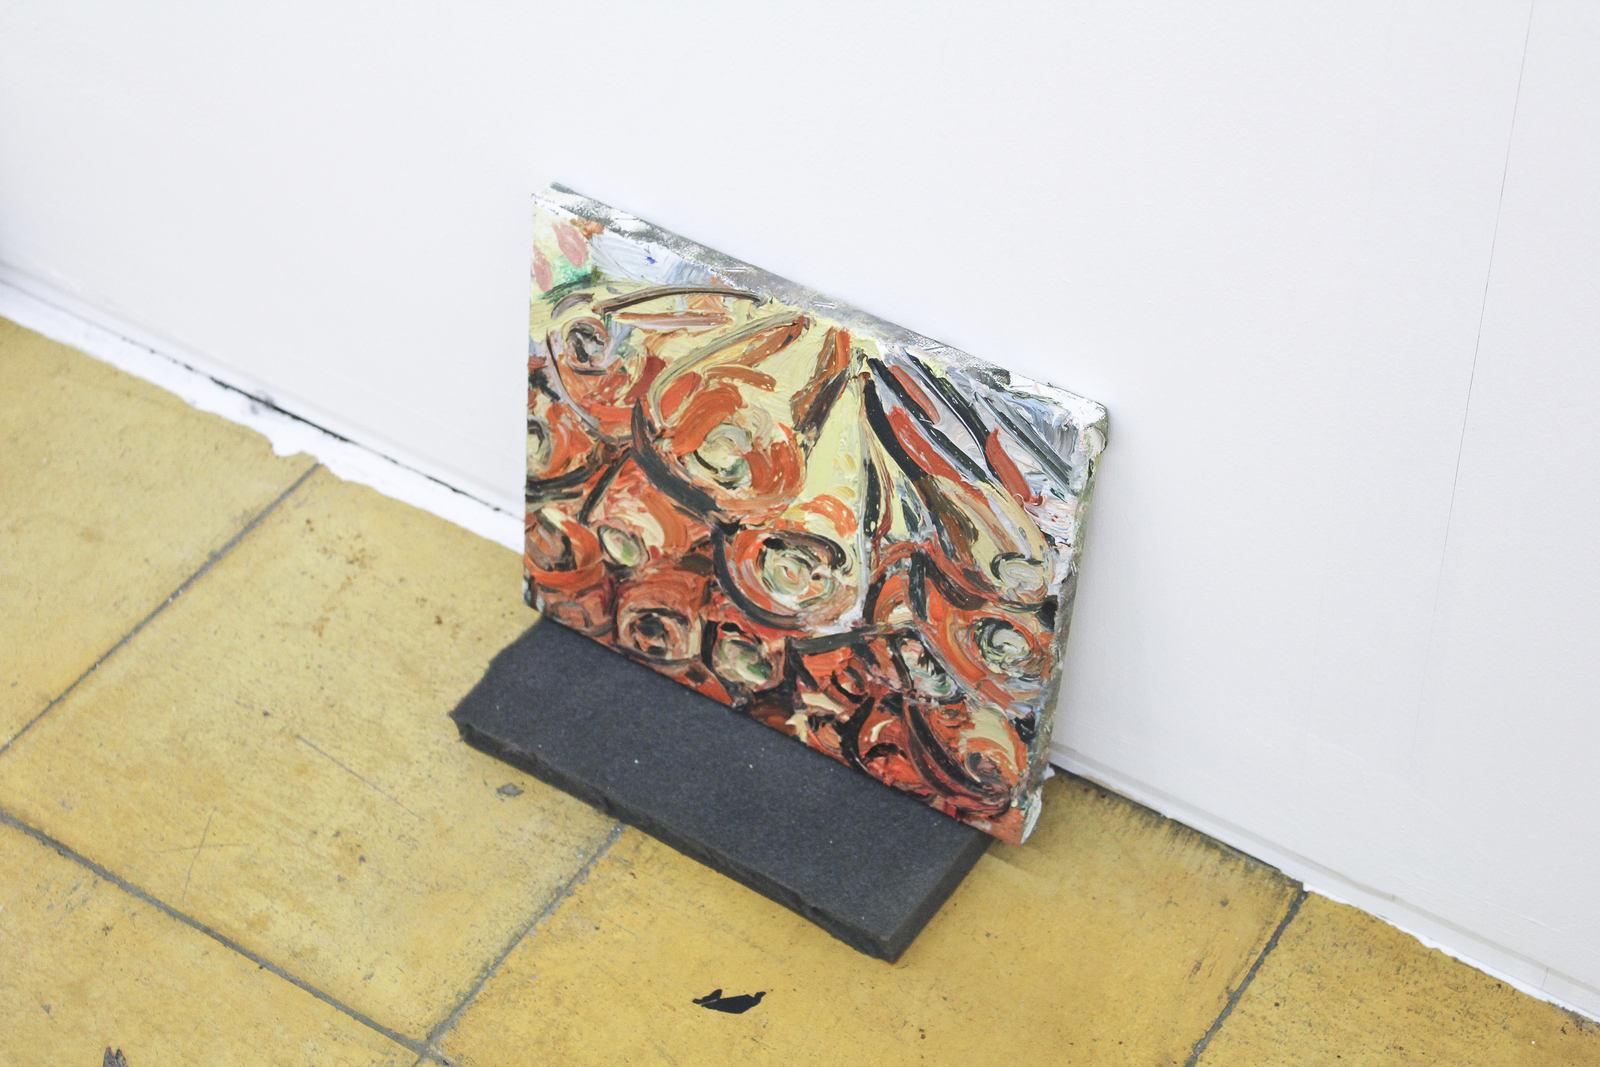 Wieske Wester at Dürst Britt & Mayhew 02